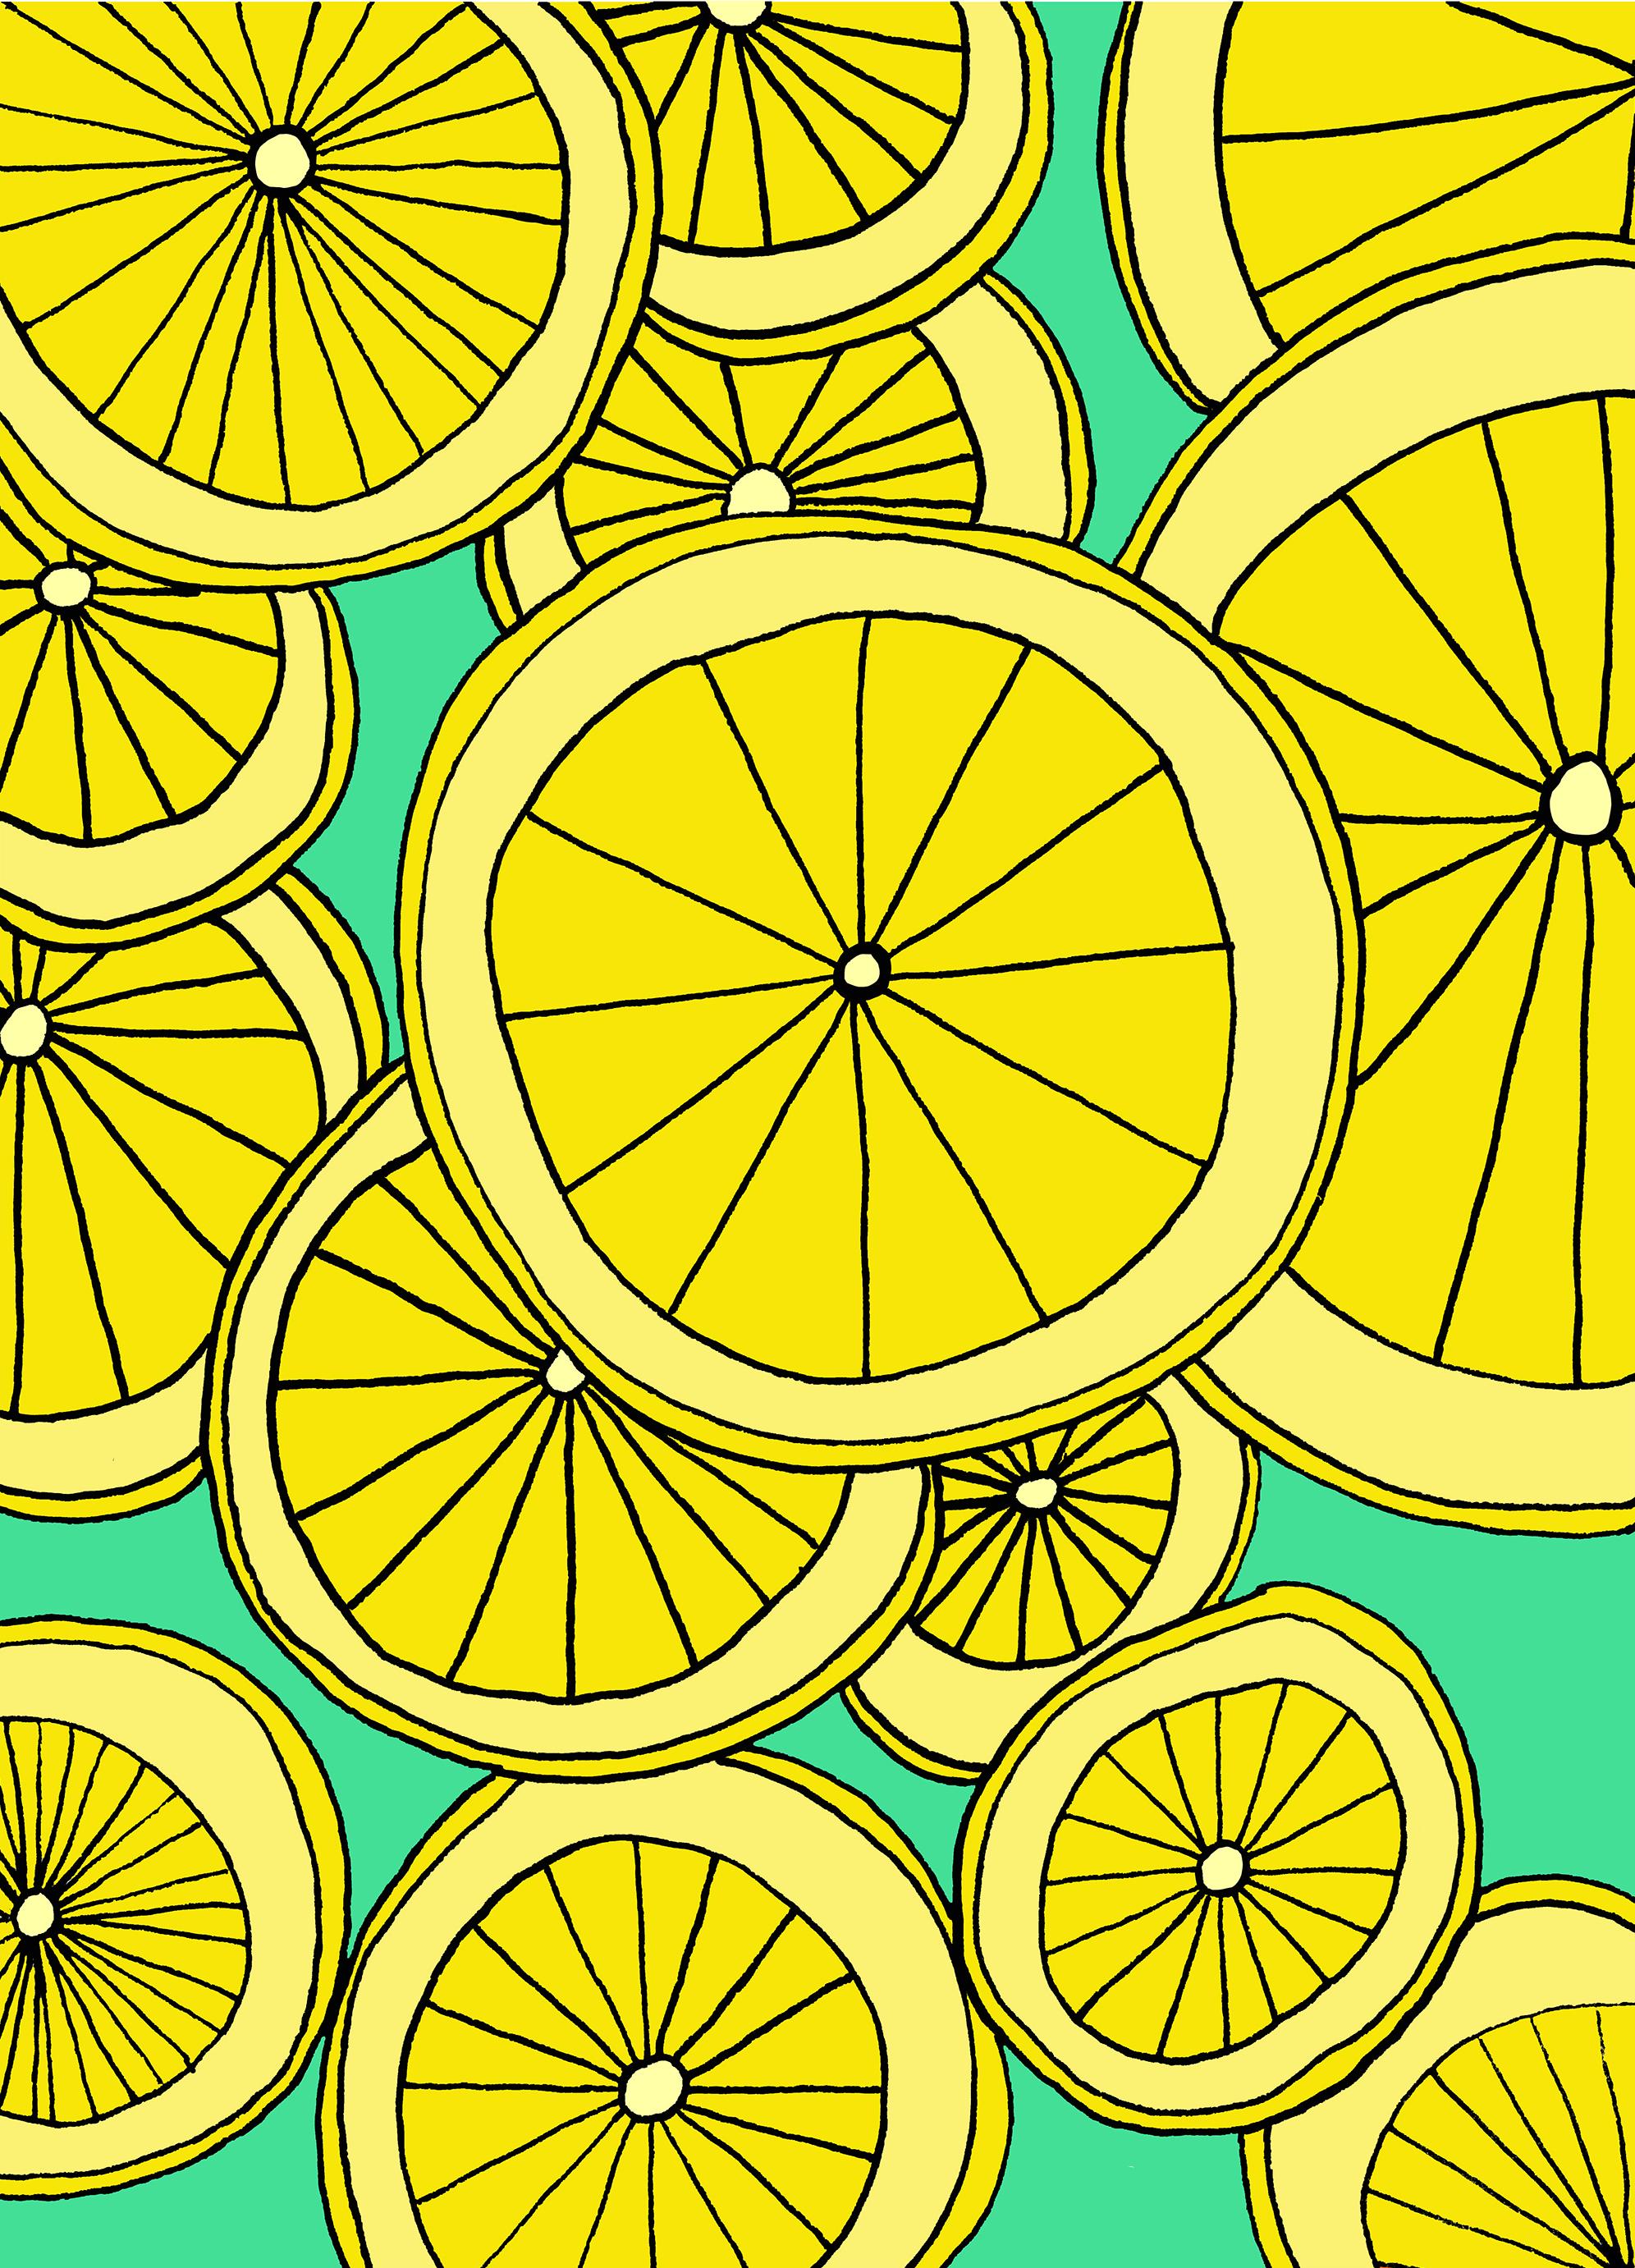 Lemons Illustration by Emma Freeman Designs